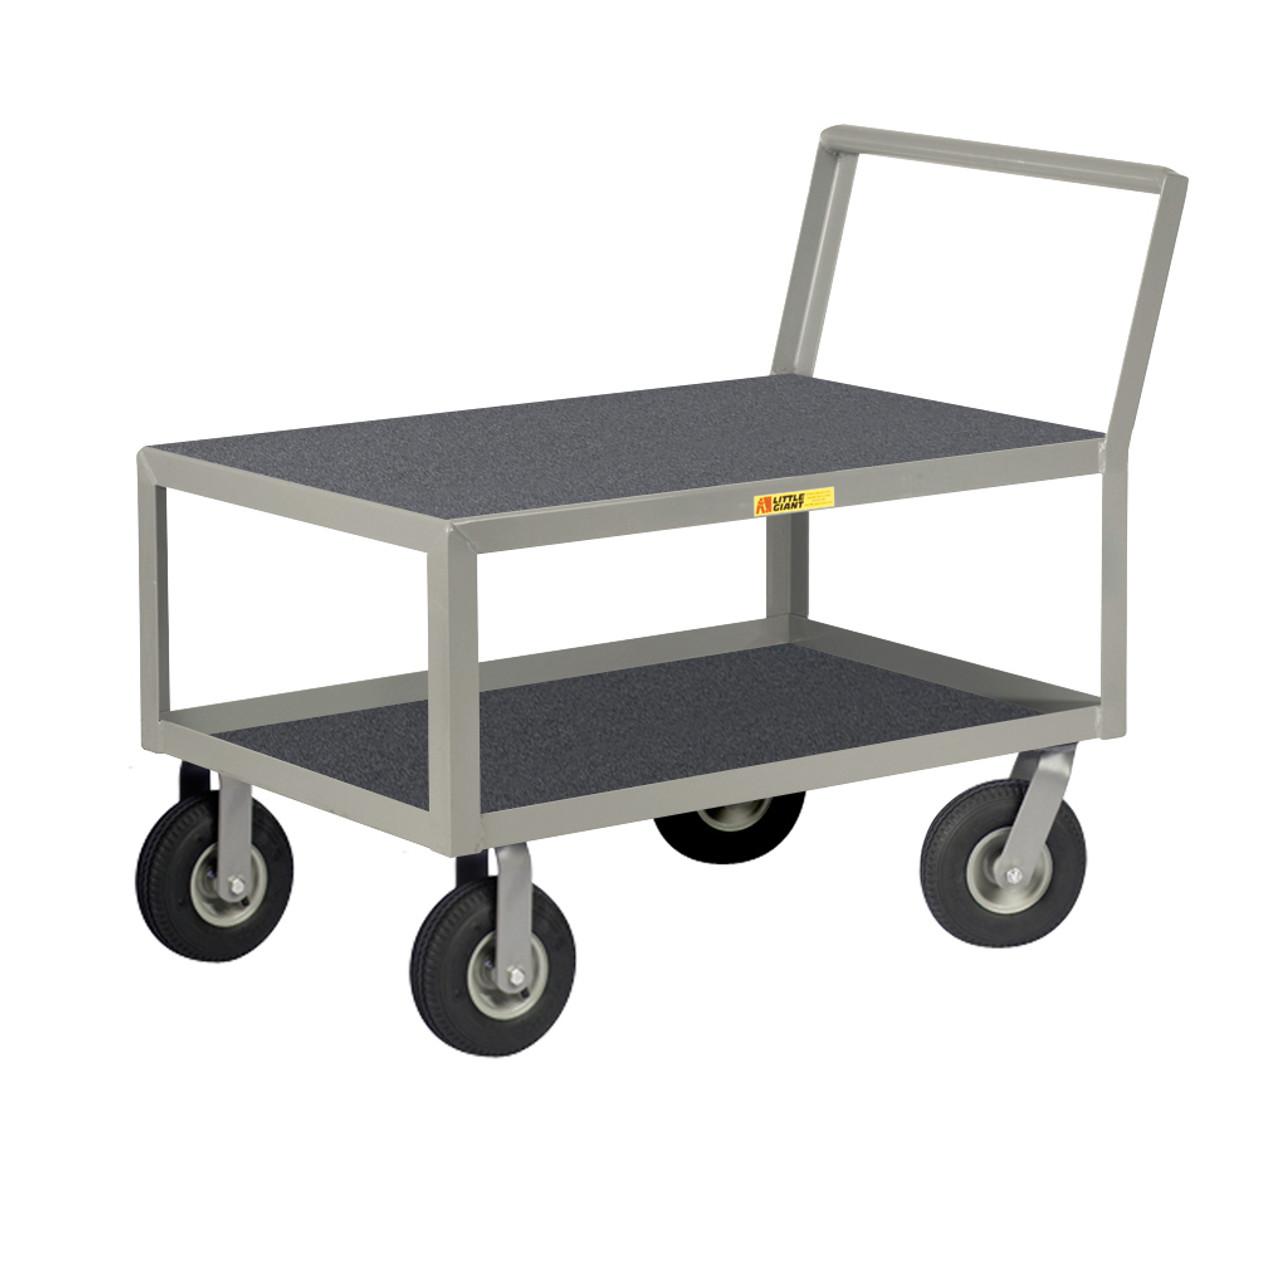 Low Deck Instrument Cart